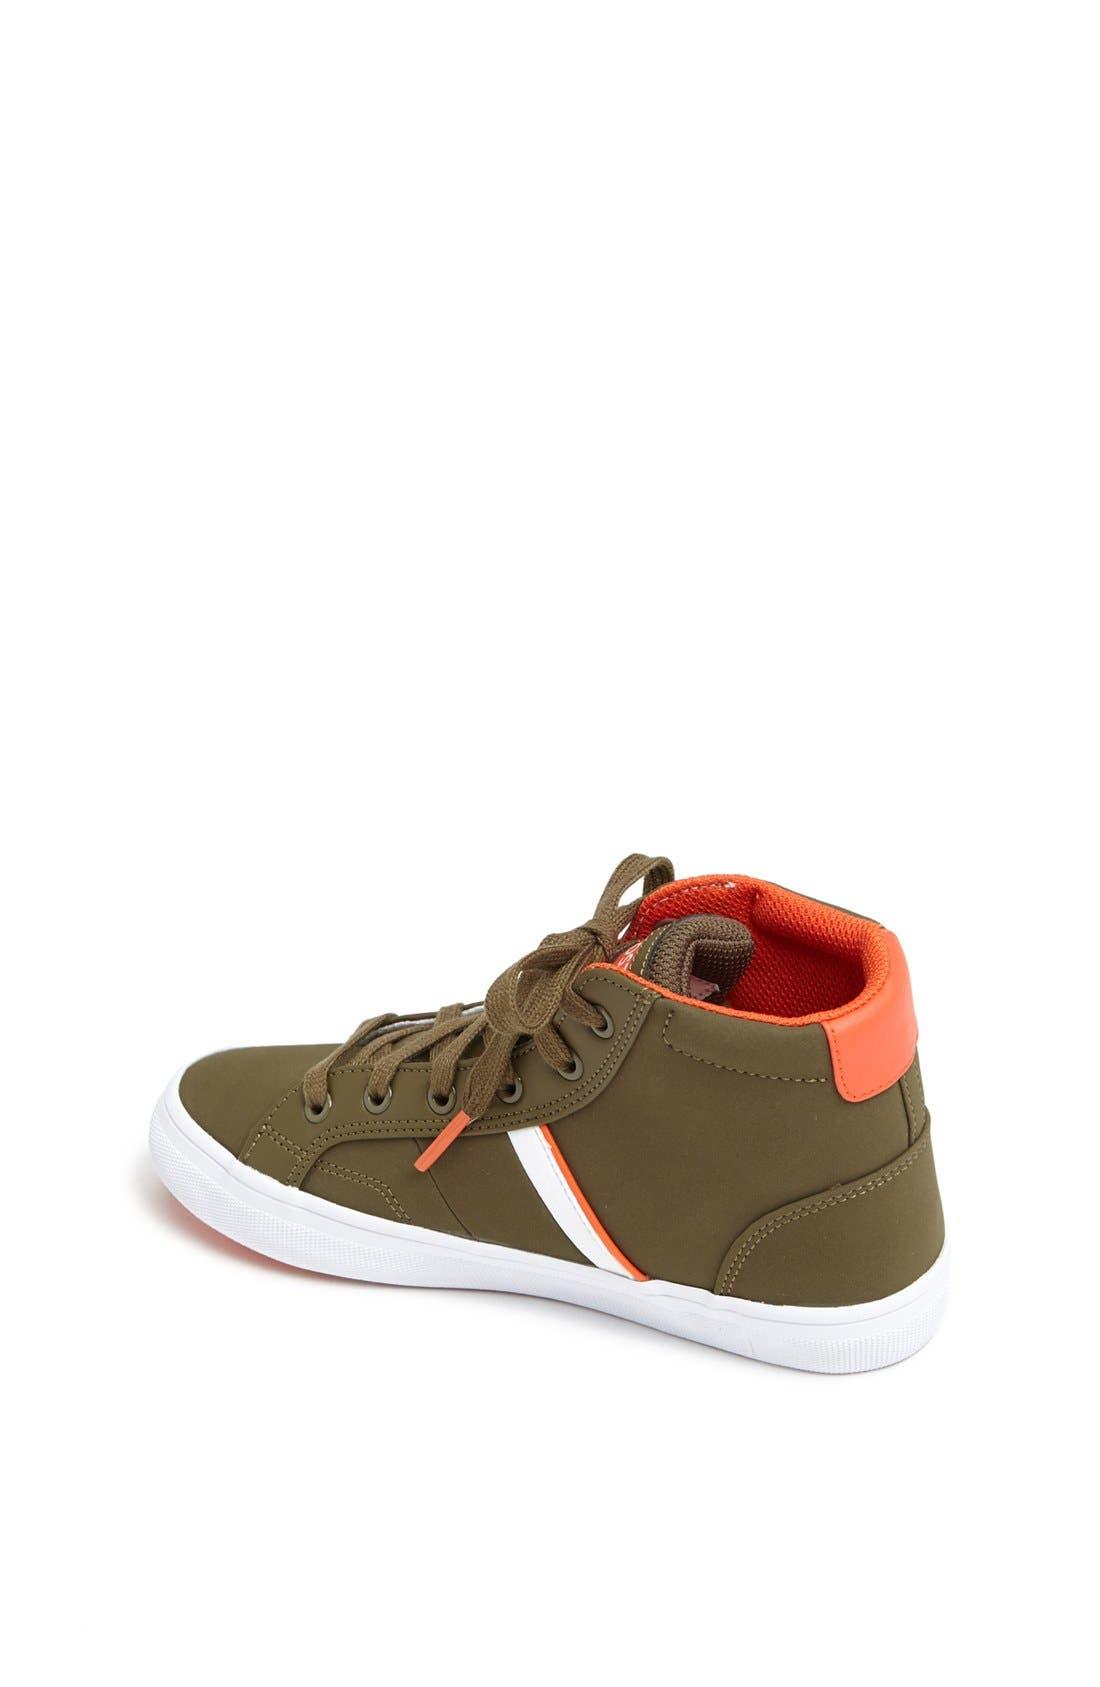 Alternate Image 2  - Lacoste 'Fairlead' High Top Sneaker (Toddler, Little Kid & Big Kid)